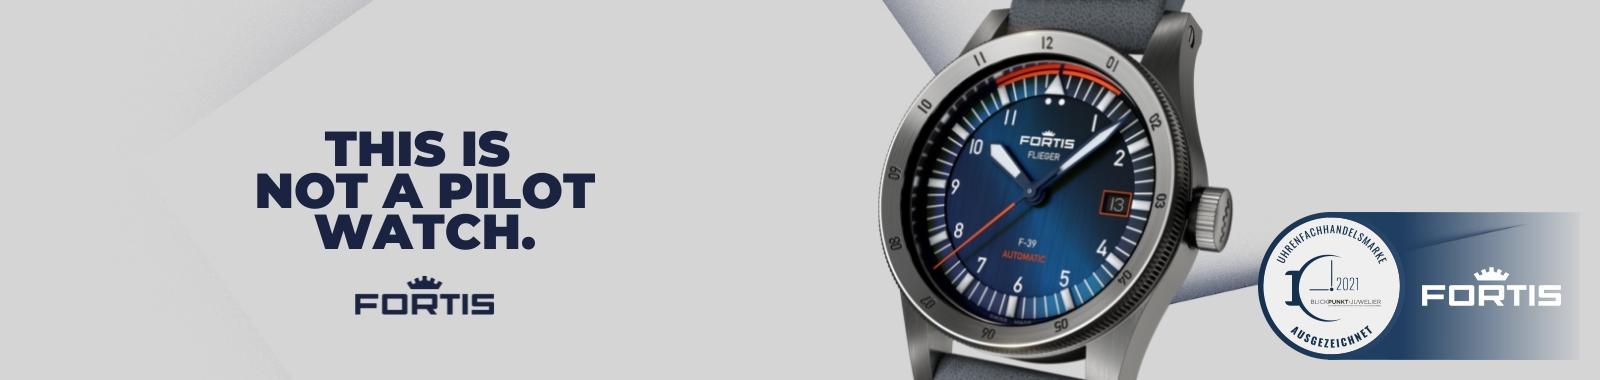 UFHM_1600x380_Fortis_Flieger_F-39_Midnight_Blue